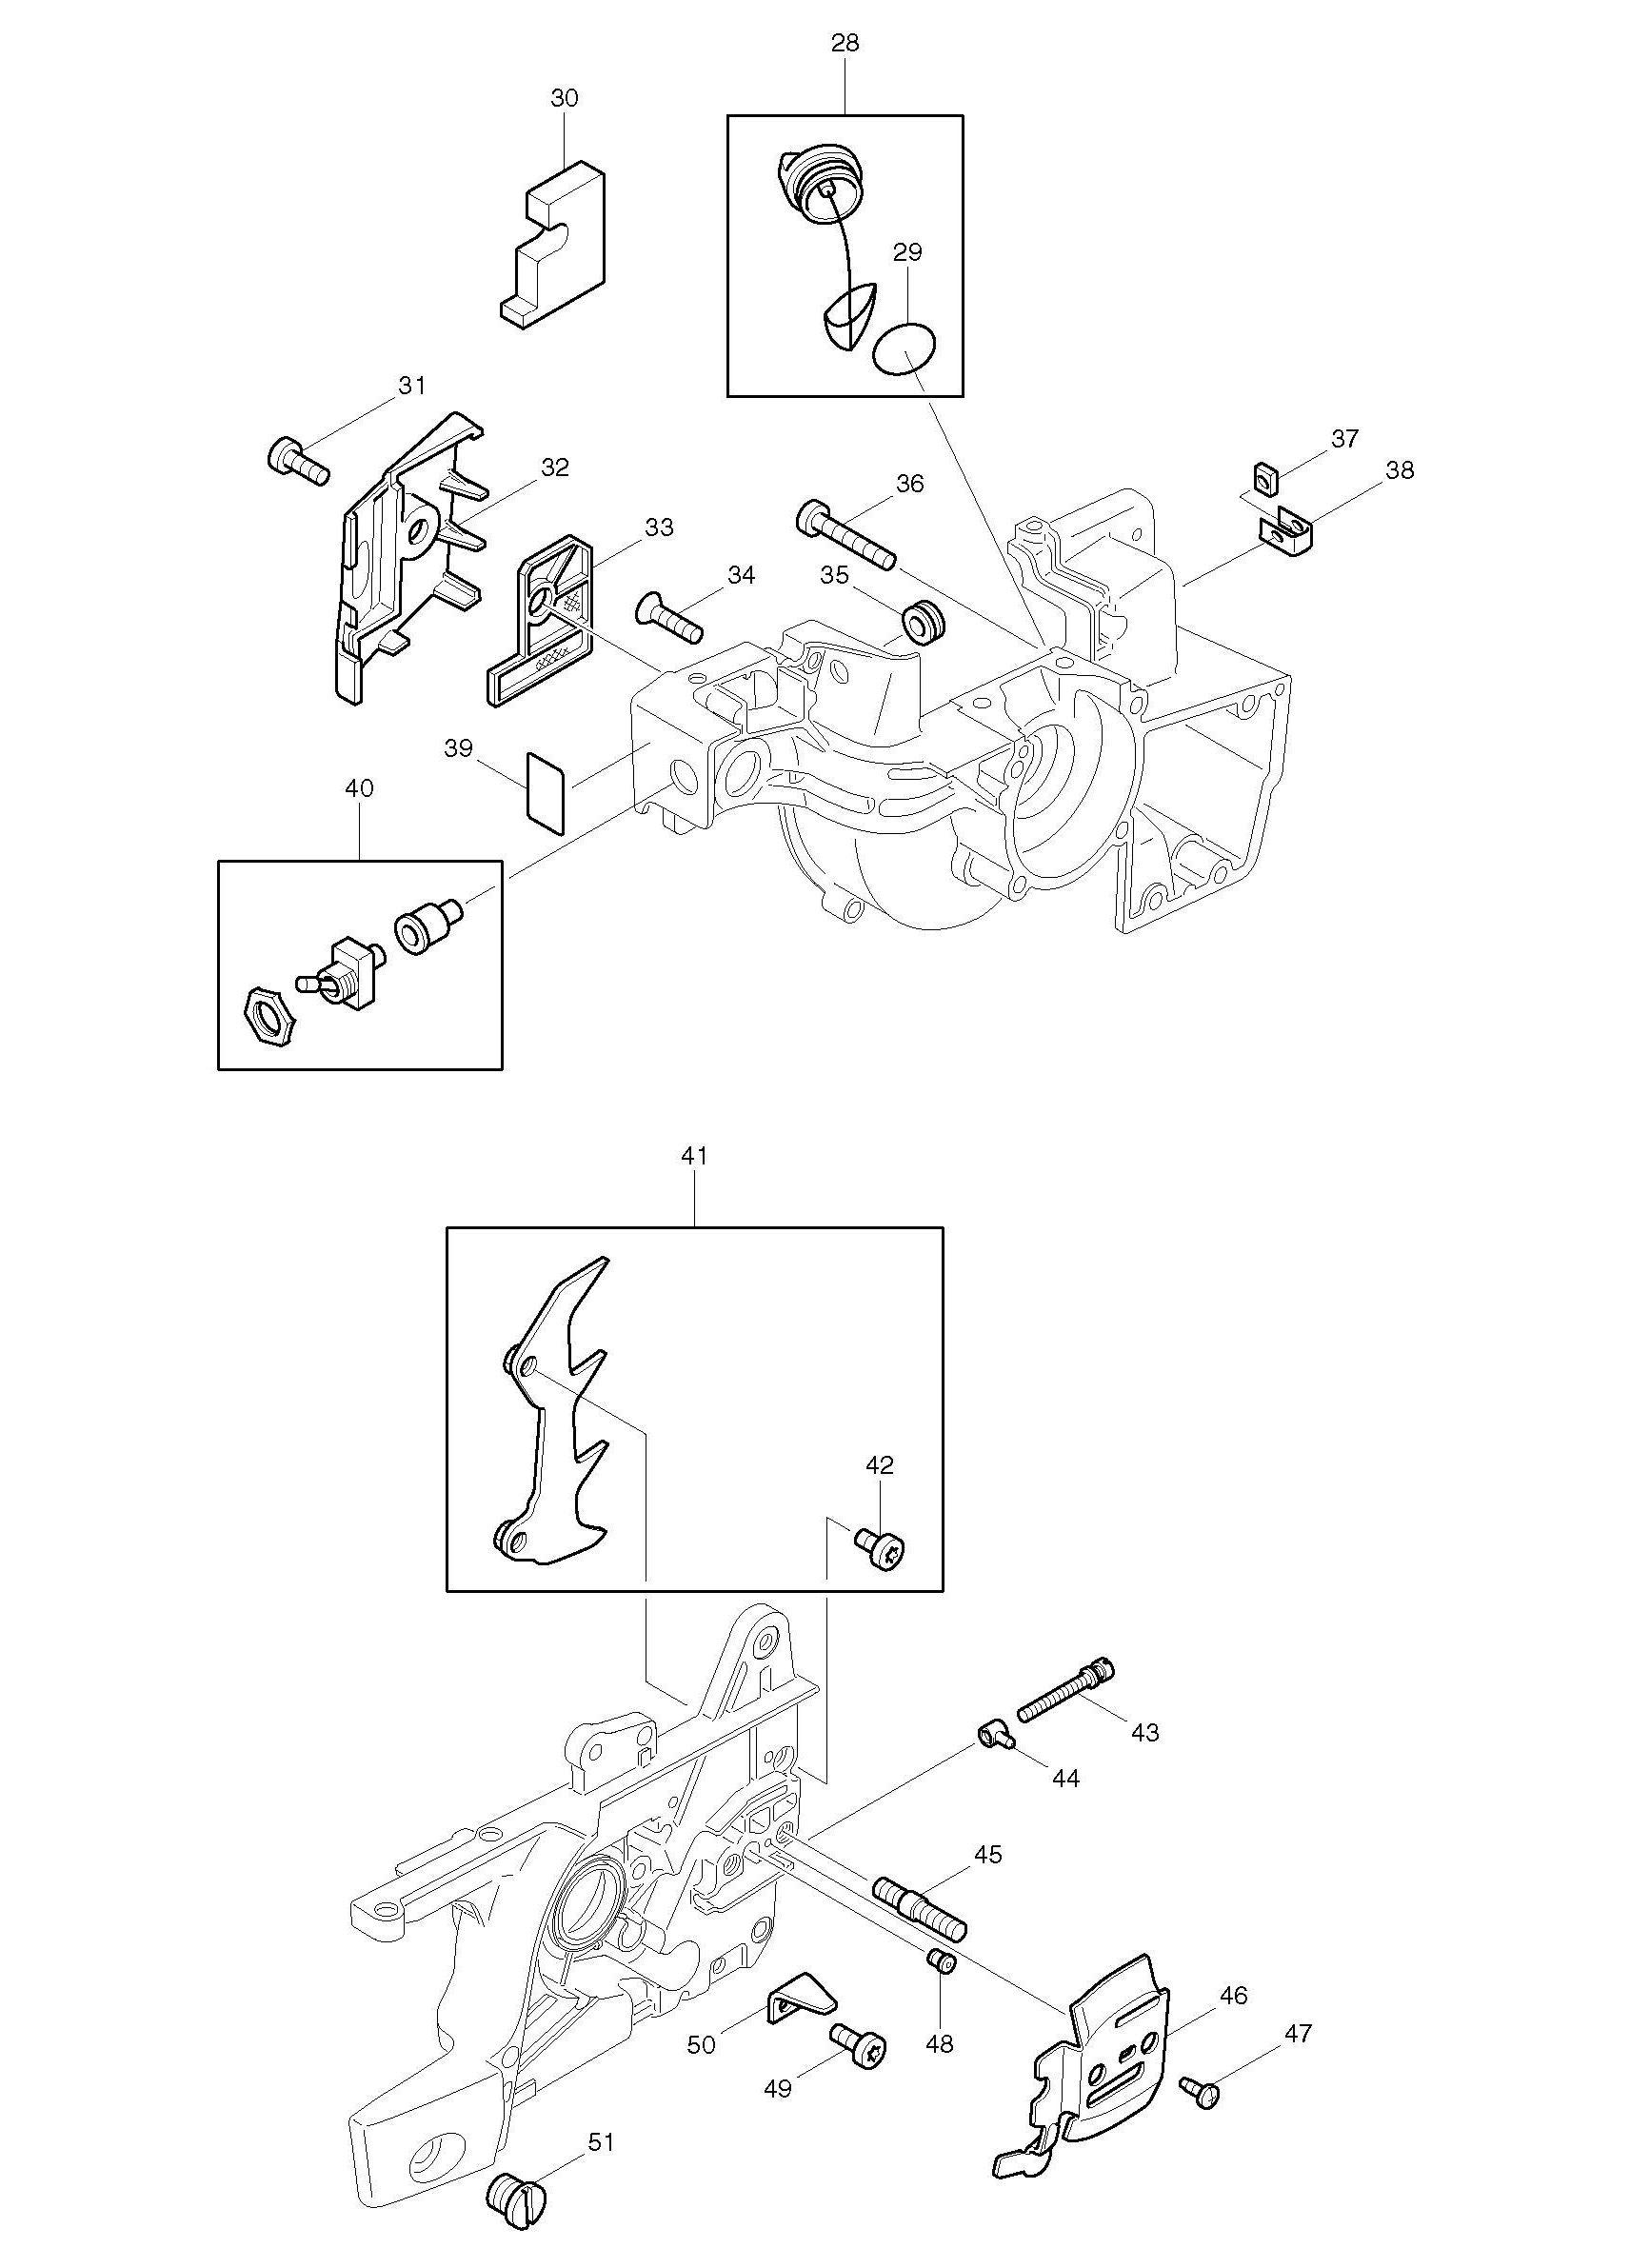 Stihl Fs 36 Parts Breakdown   Wiring Diagram Database